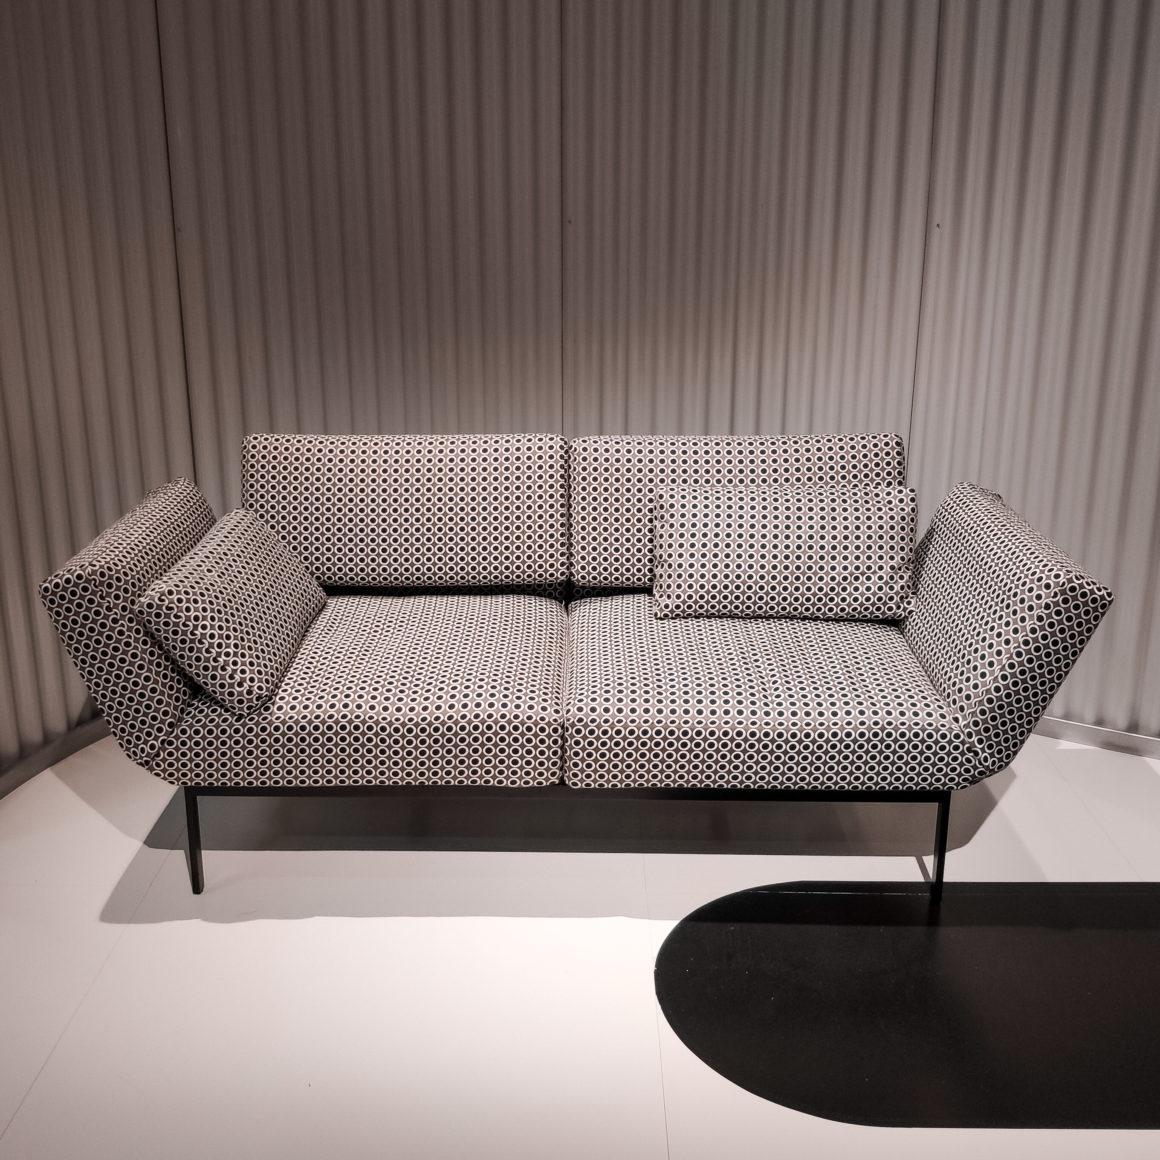 roro-Sofa von Brühl